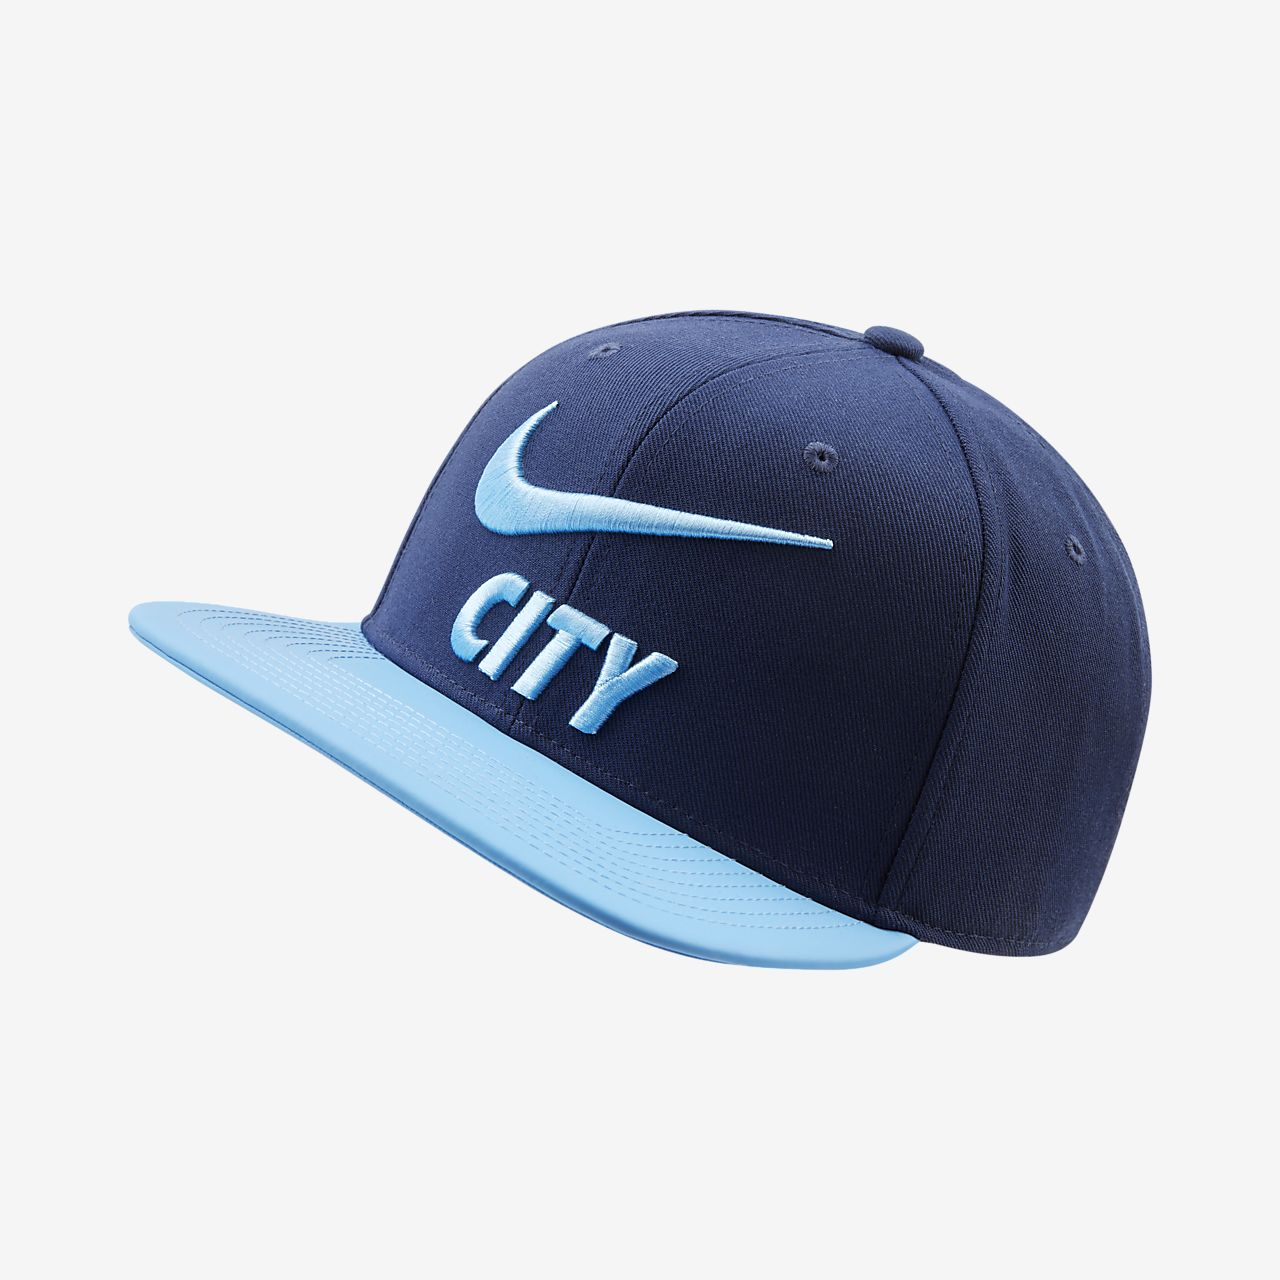 112cbec4c5862 Manchester City FC Pro Adjustable Hat. Nike.com HU